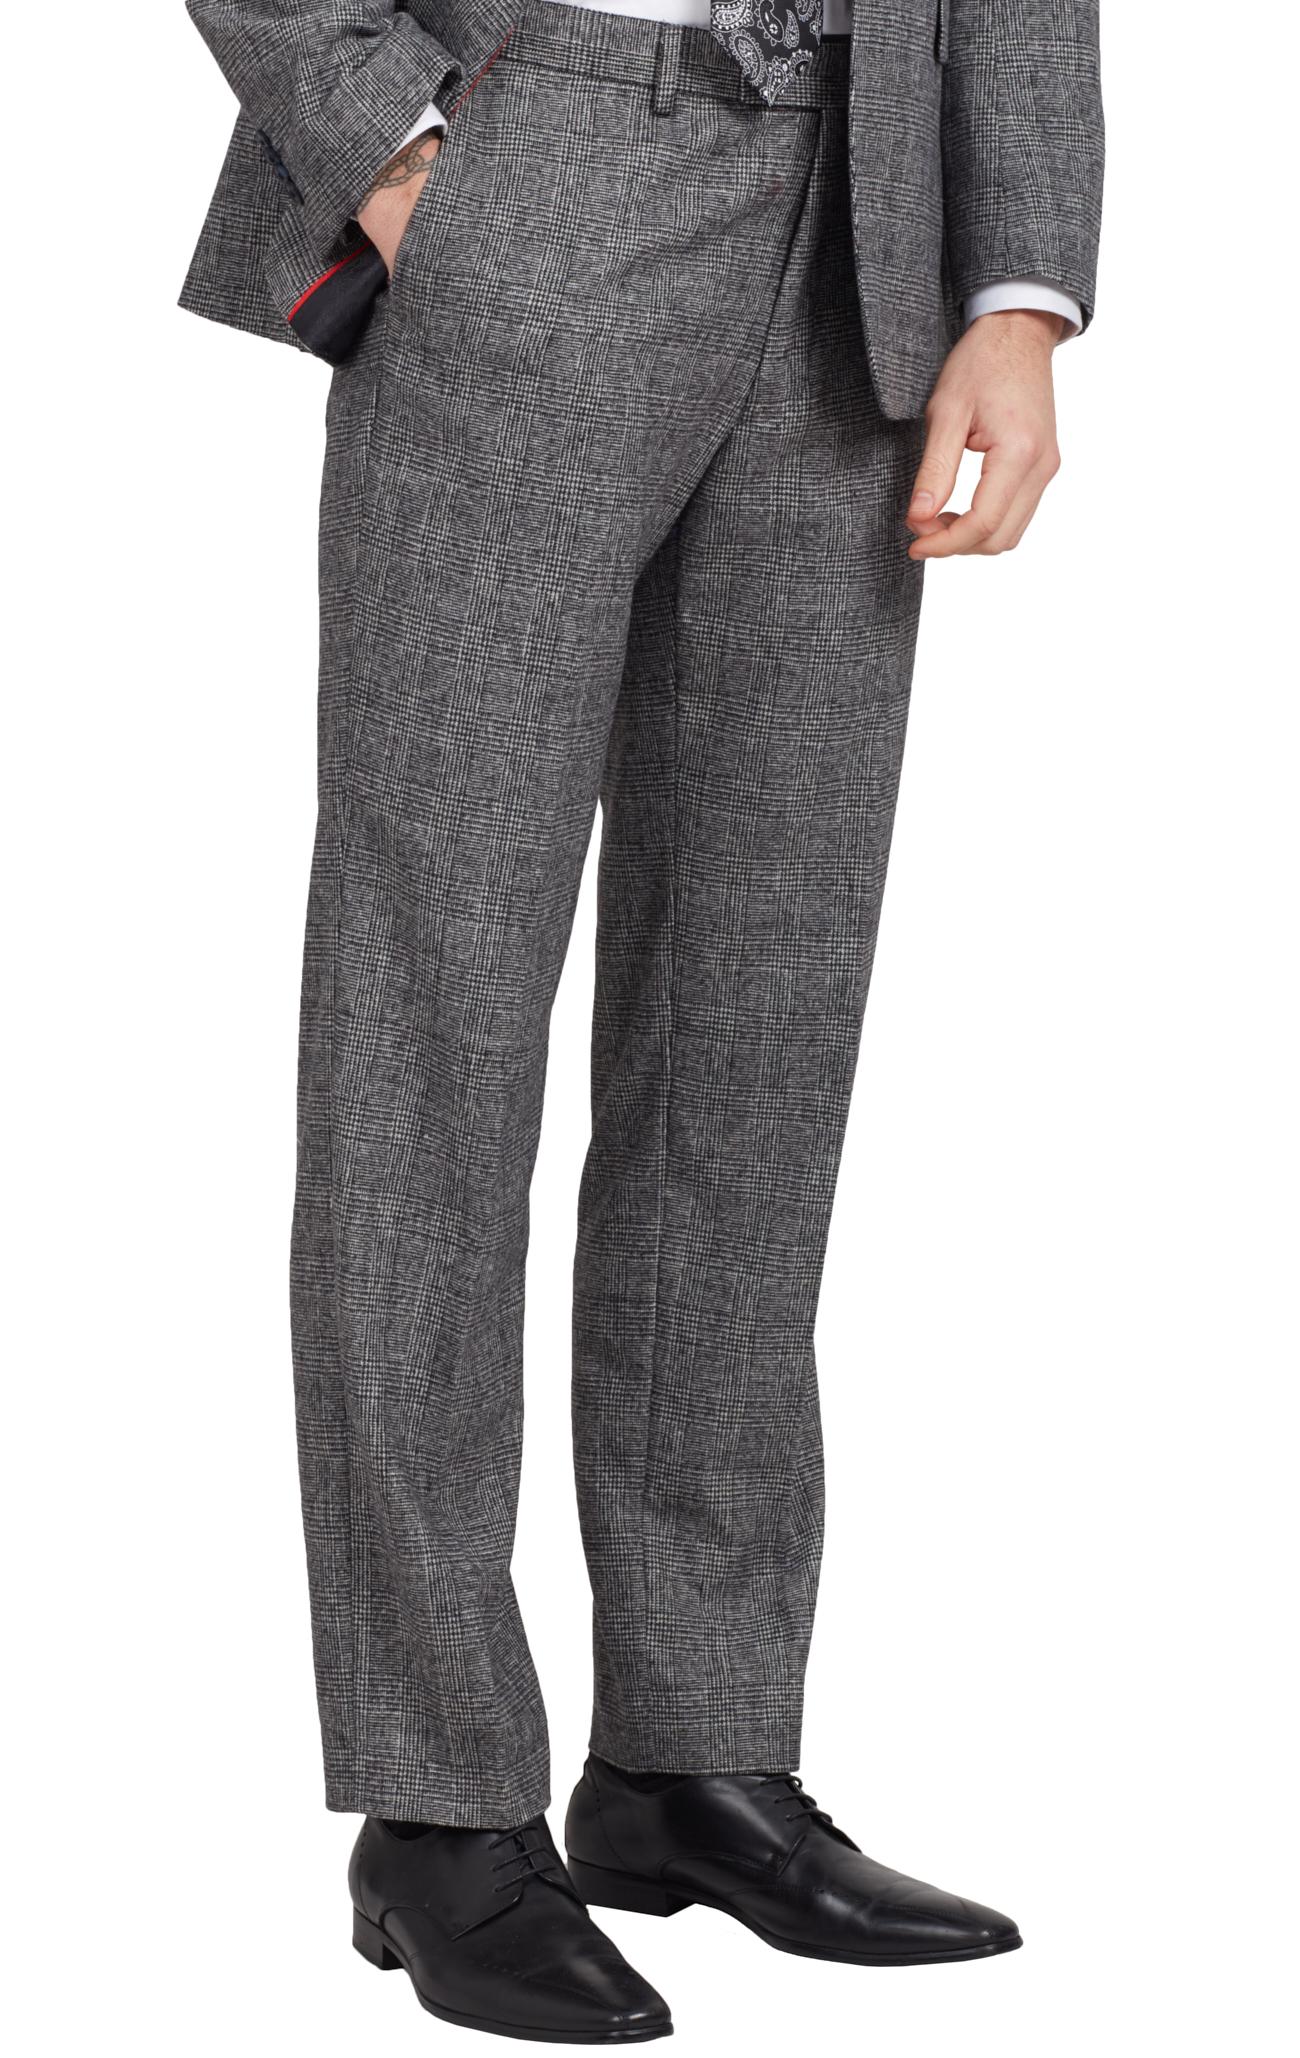 Dobell Mens Black Suit Trousers Regular Fit